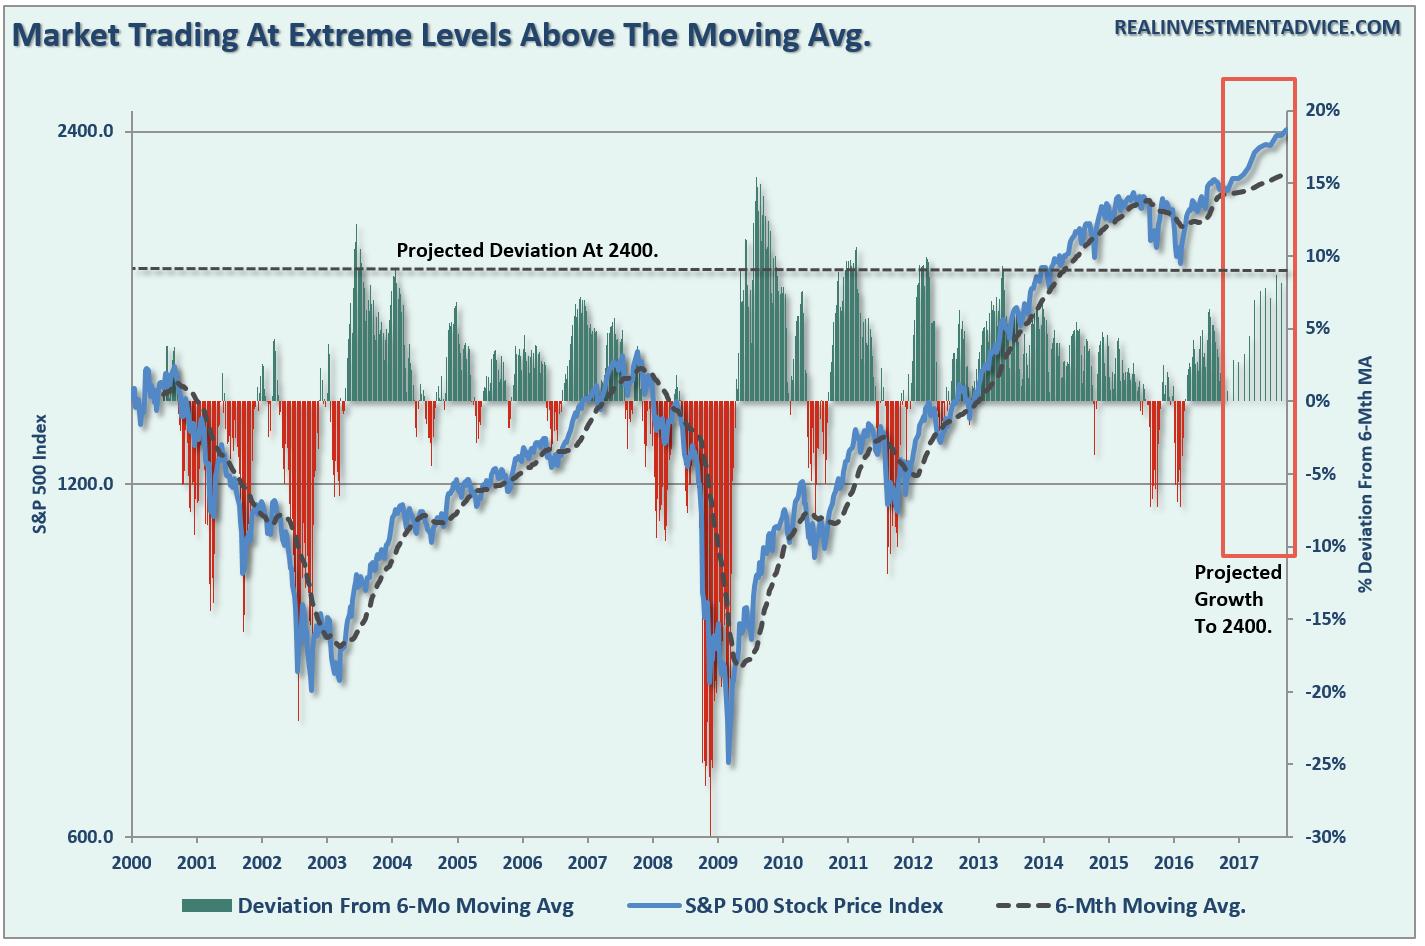 S&P 500 Deviation